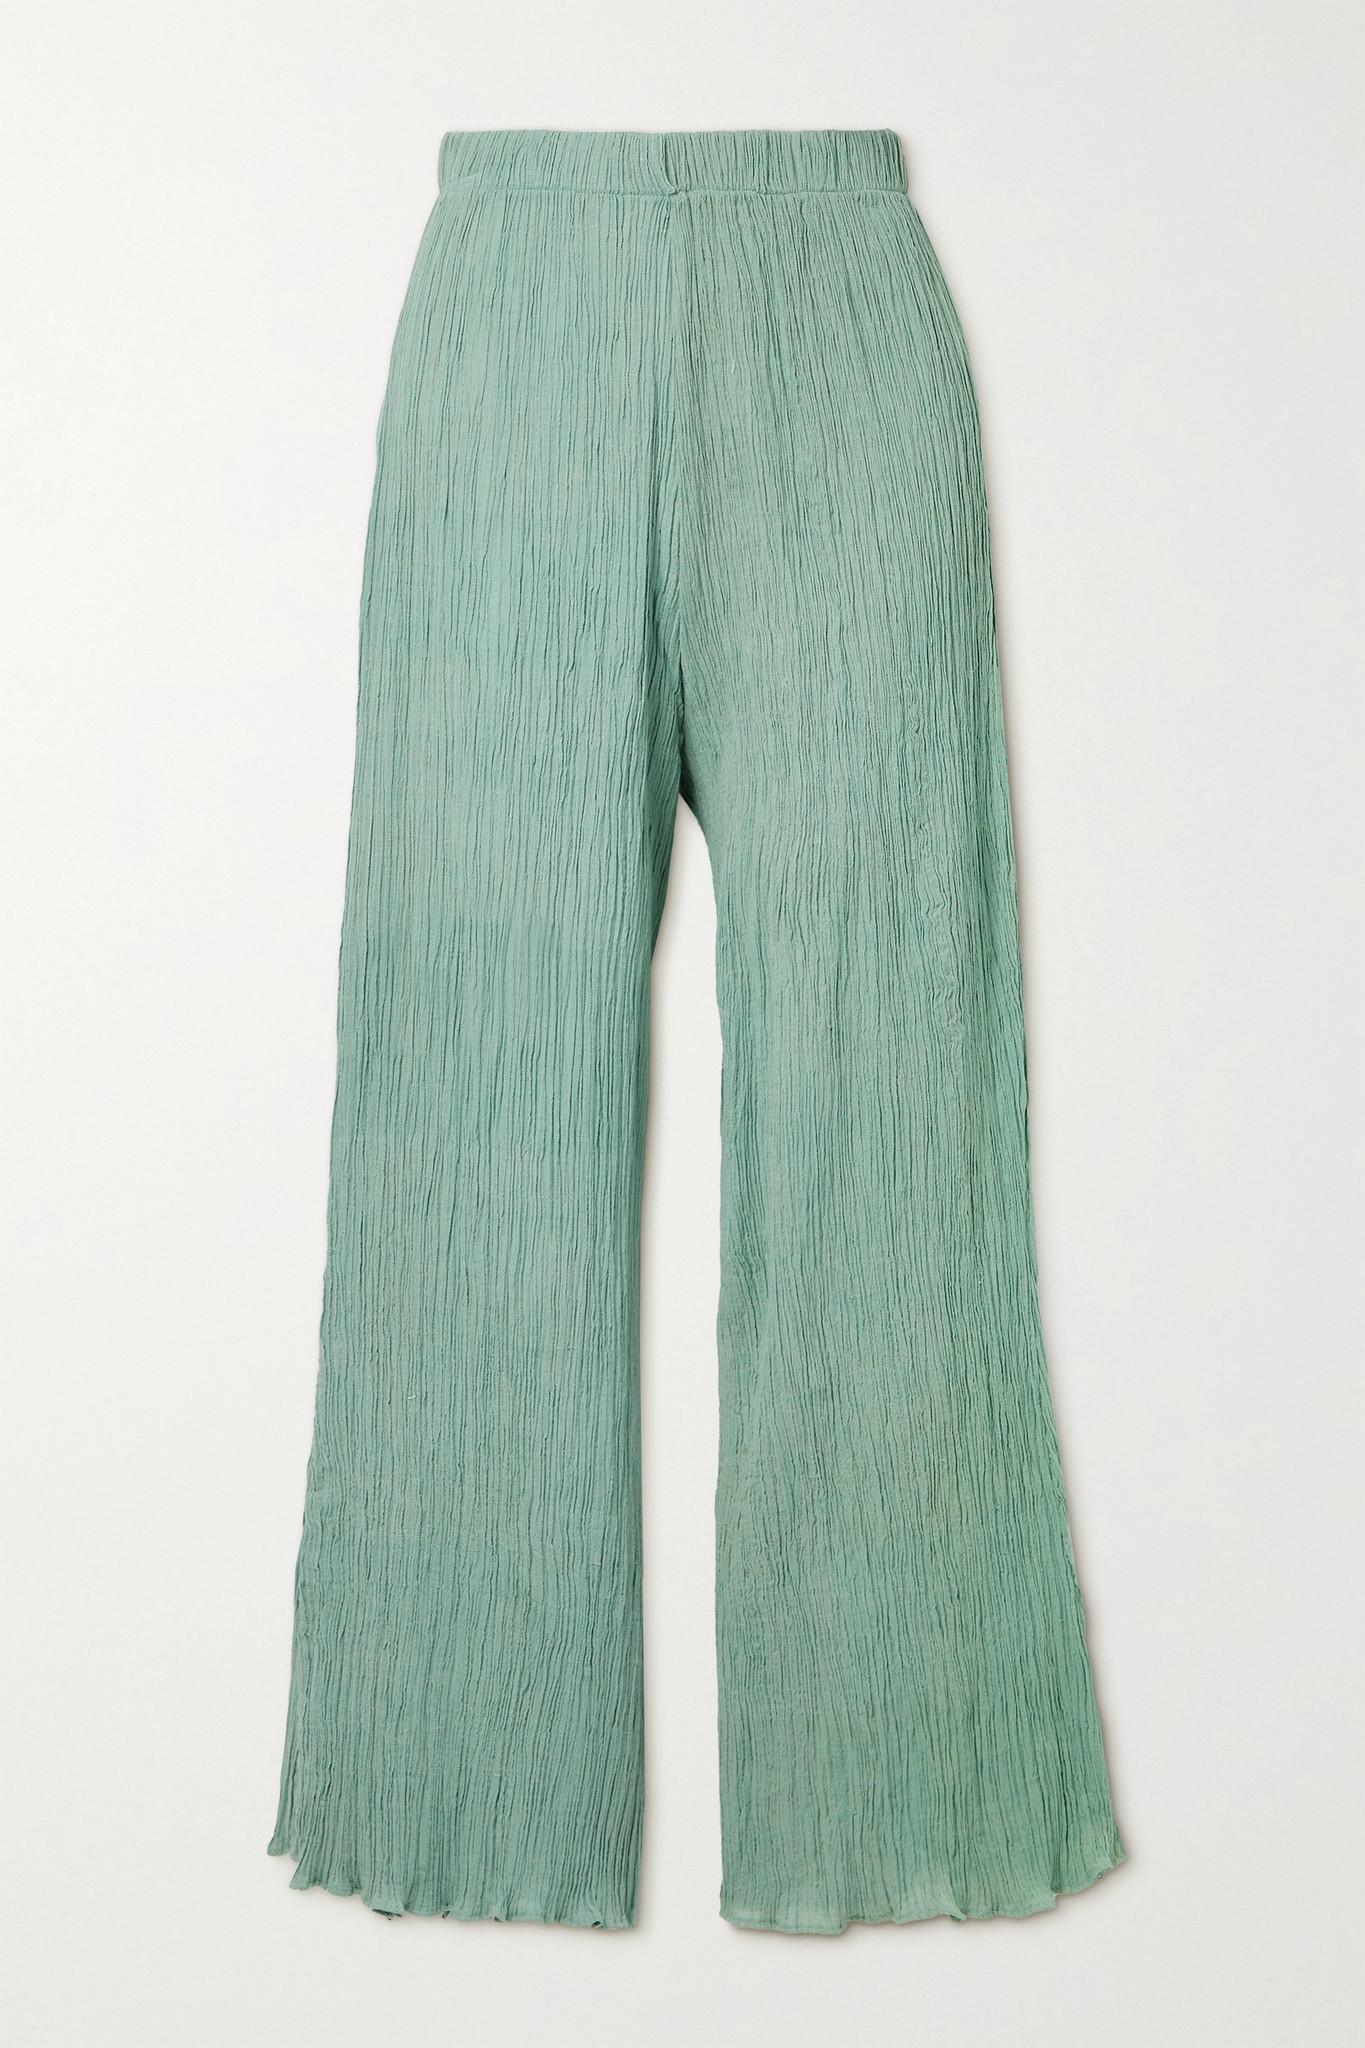 SAVANNAH MORROW THE LABEL - 【net Sustain】june 褶皱有机纯棉薄纱长裤 - 绿色 - large